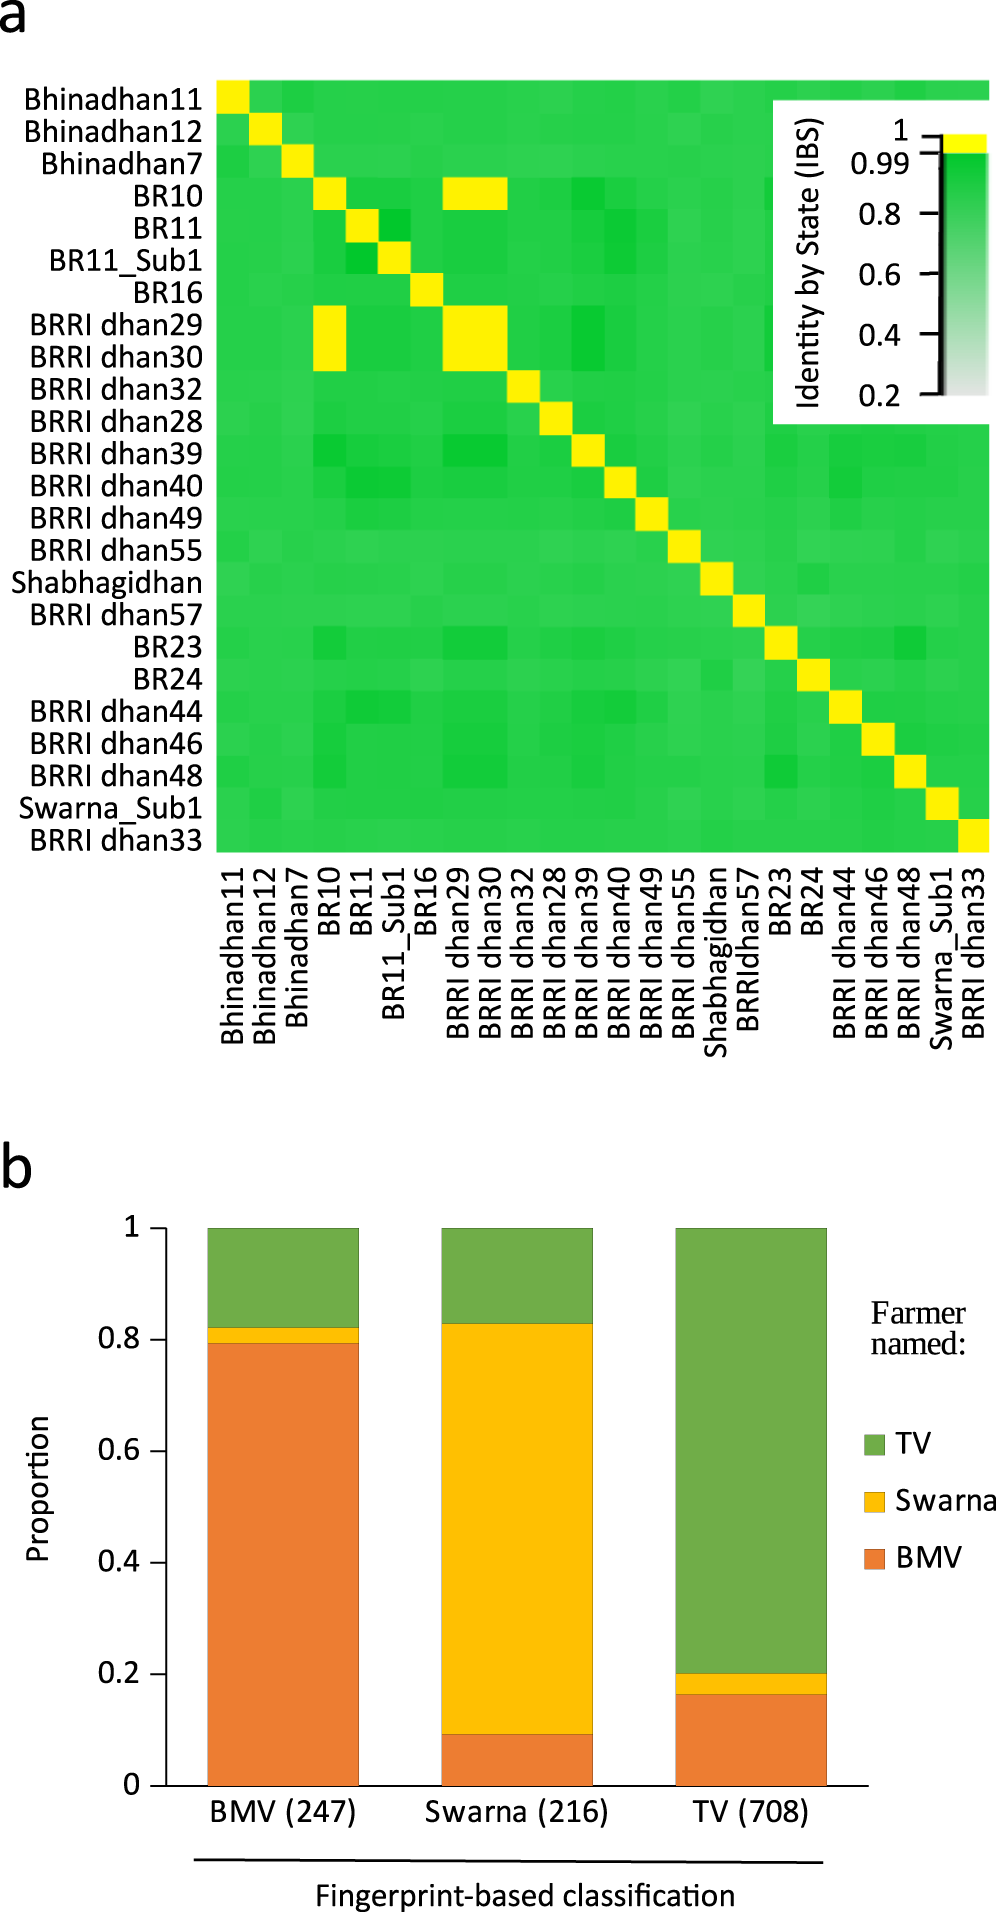 DNA fingerprinting at farm level maps rice biodiversity